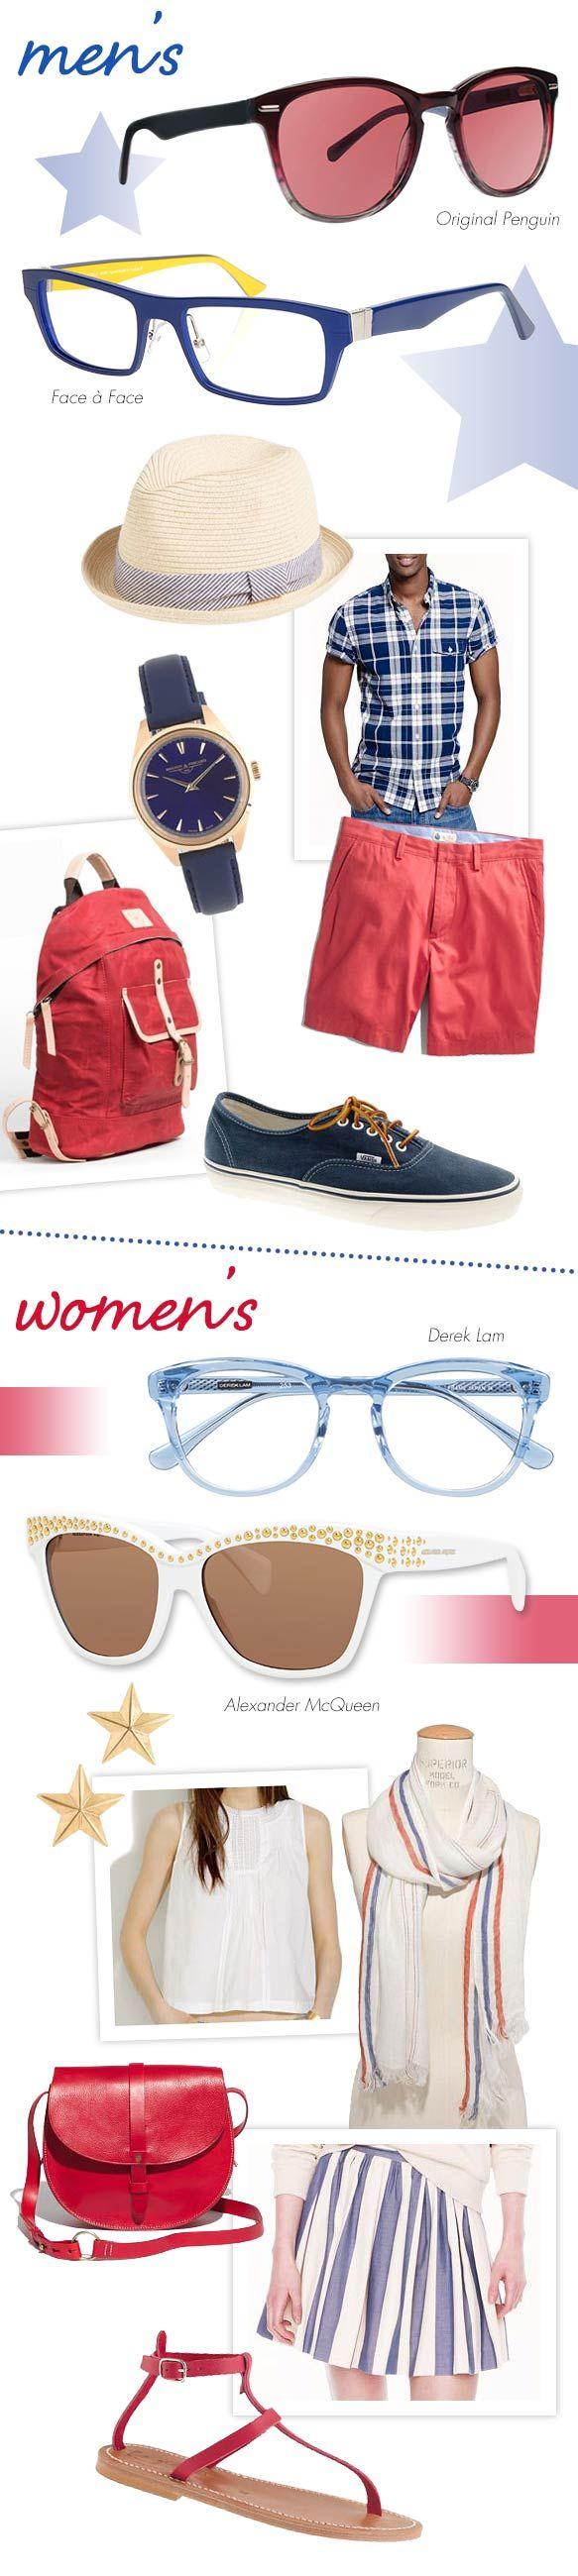 Specs, Shades + Garb for Patriotic Style: http://eyecessorizeblog.com/?p=5966